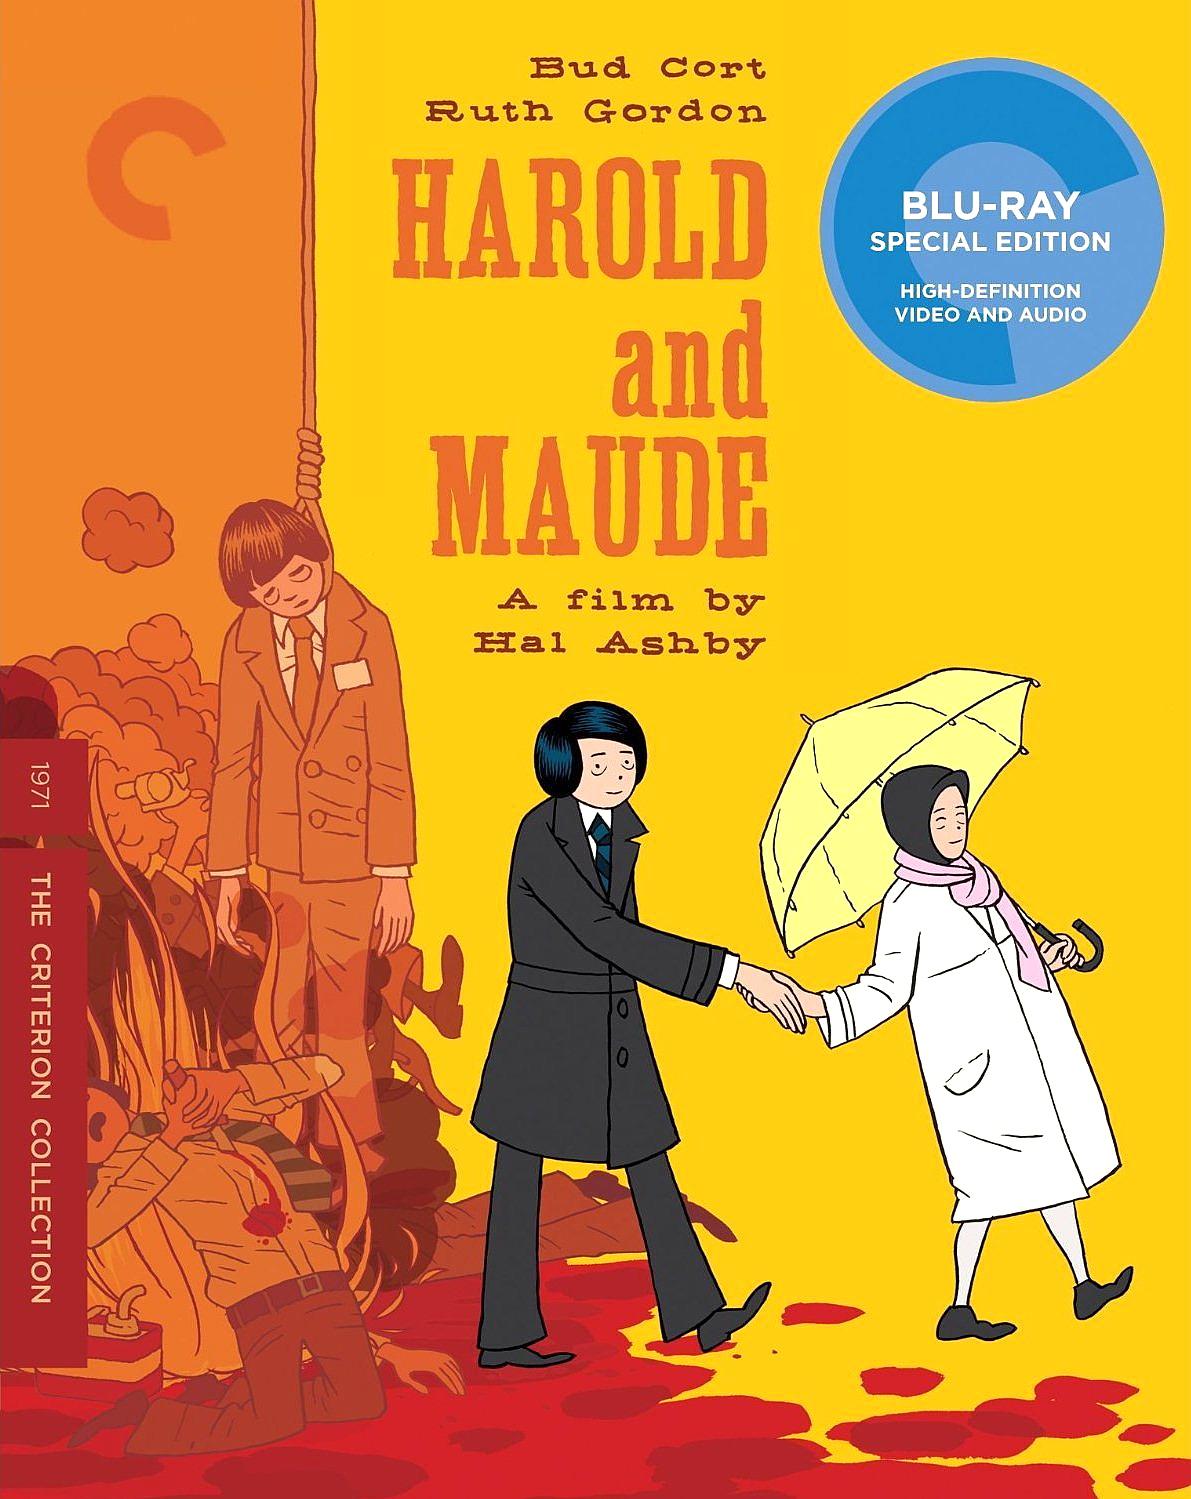 Harold and maude blu ray